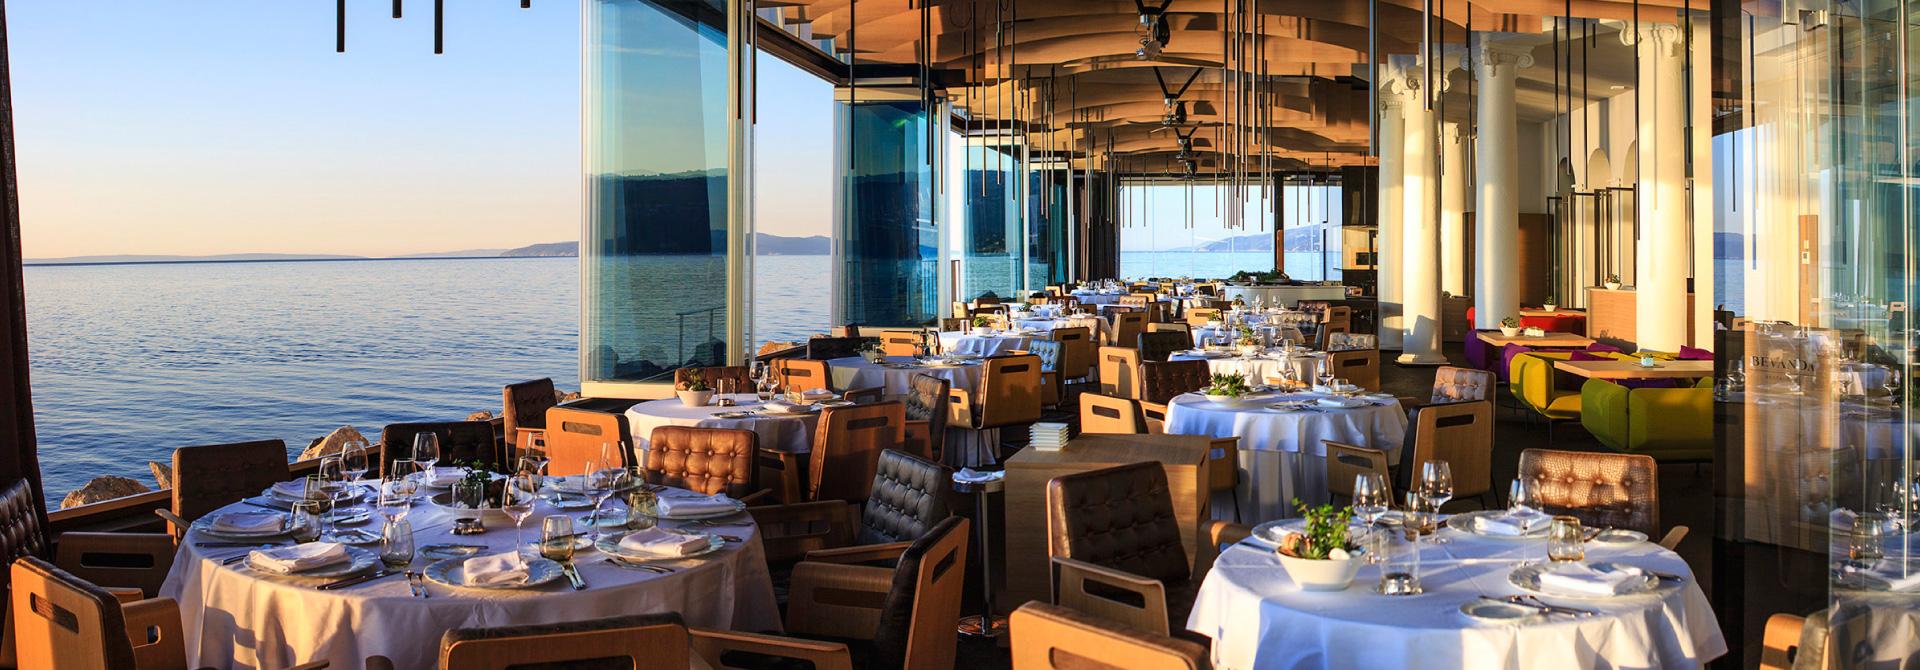 Restaurant bevanda 5 star design hotel restaurant for Design hotel opatija croatia